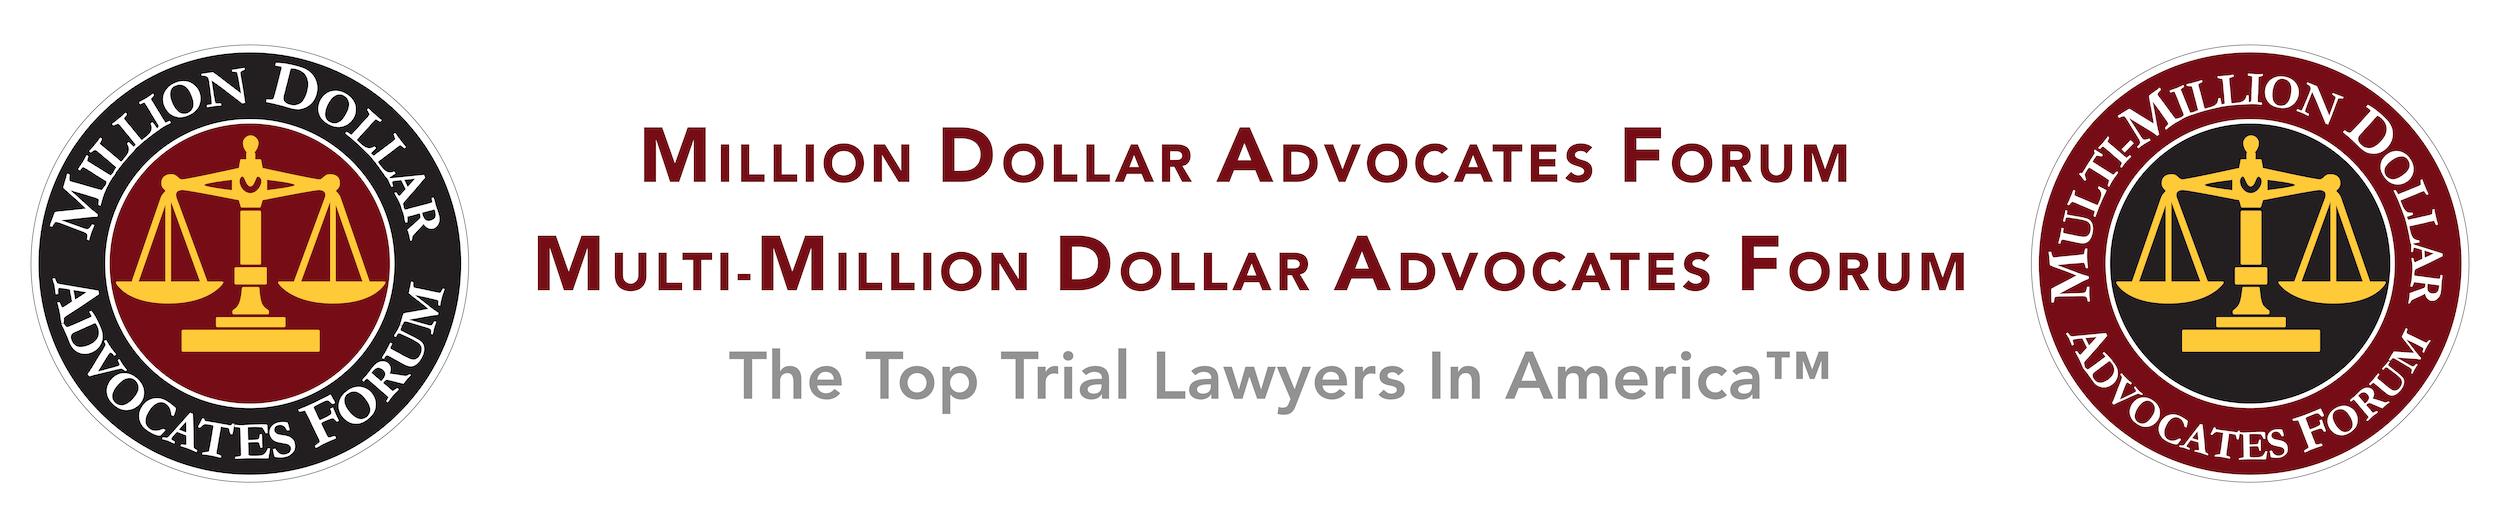 Million Dollar Advocates Forum & Multi-Million Dollar Advocates Forum Member; The Top Trial Lawyers in America™